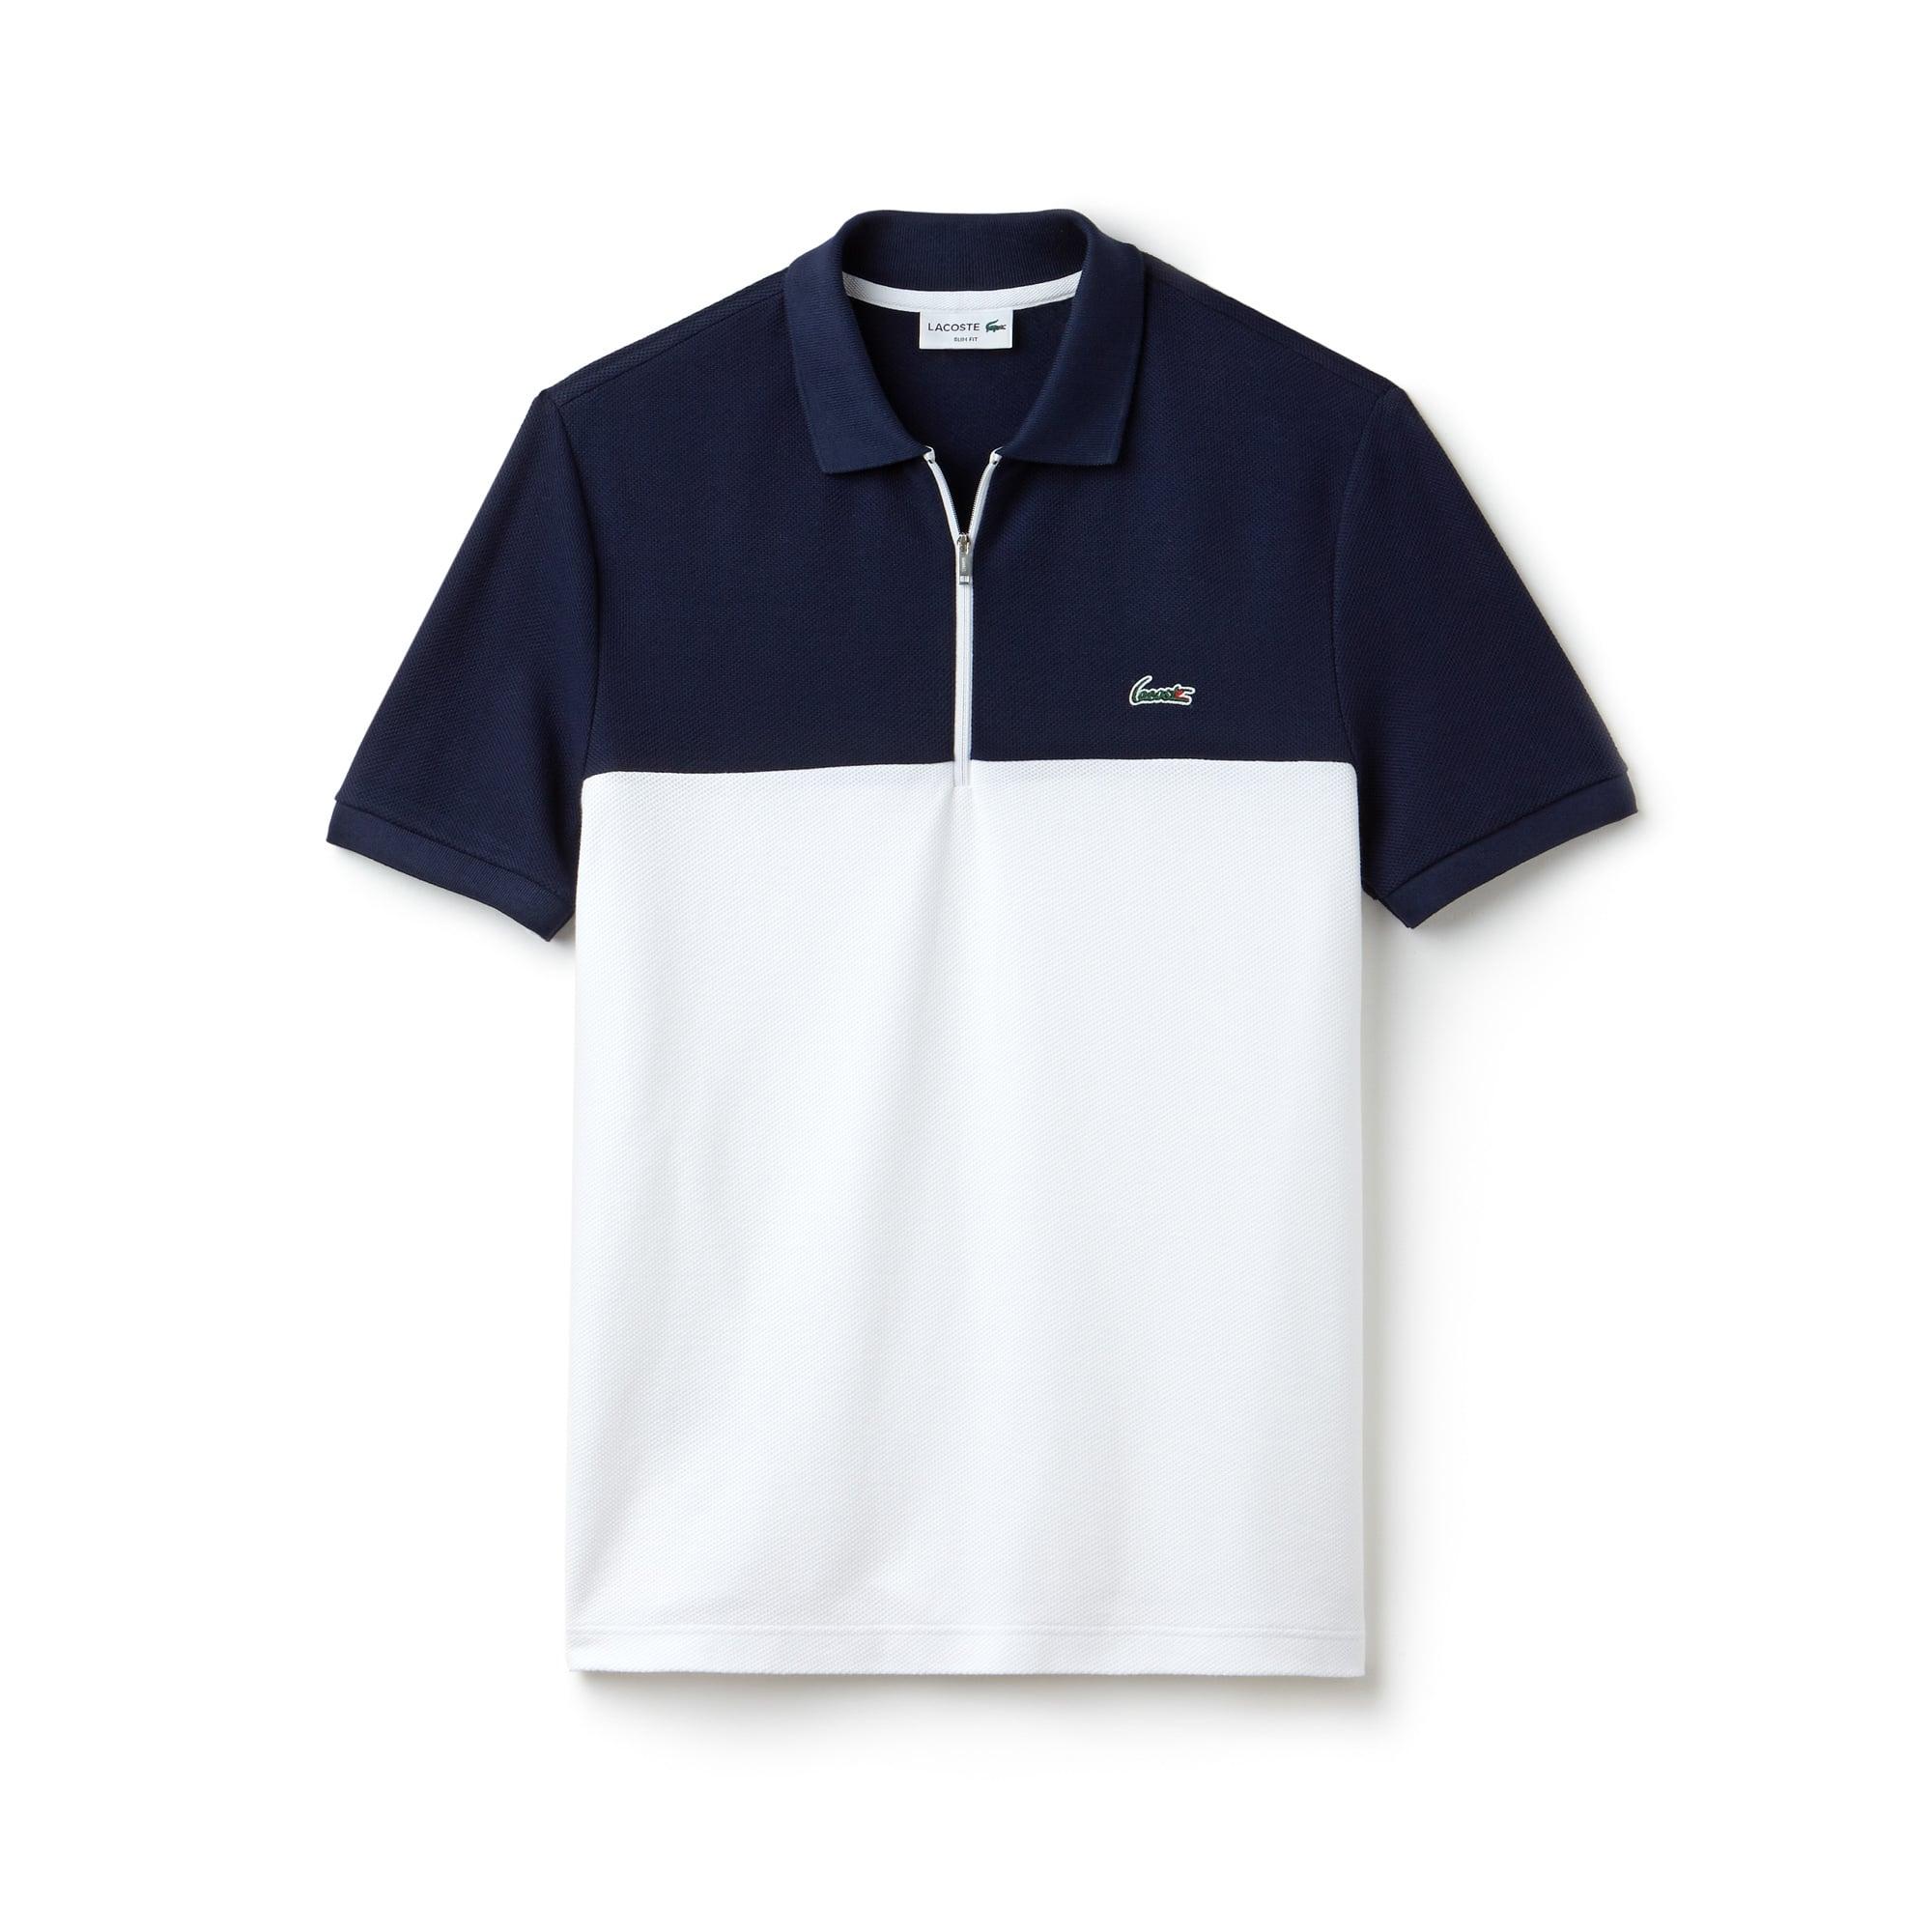 36f8e9f4b قميص بولو رجالي من لاكوست بمقاس ضيق وبألوان متصادمة وبخامة قطنية ...